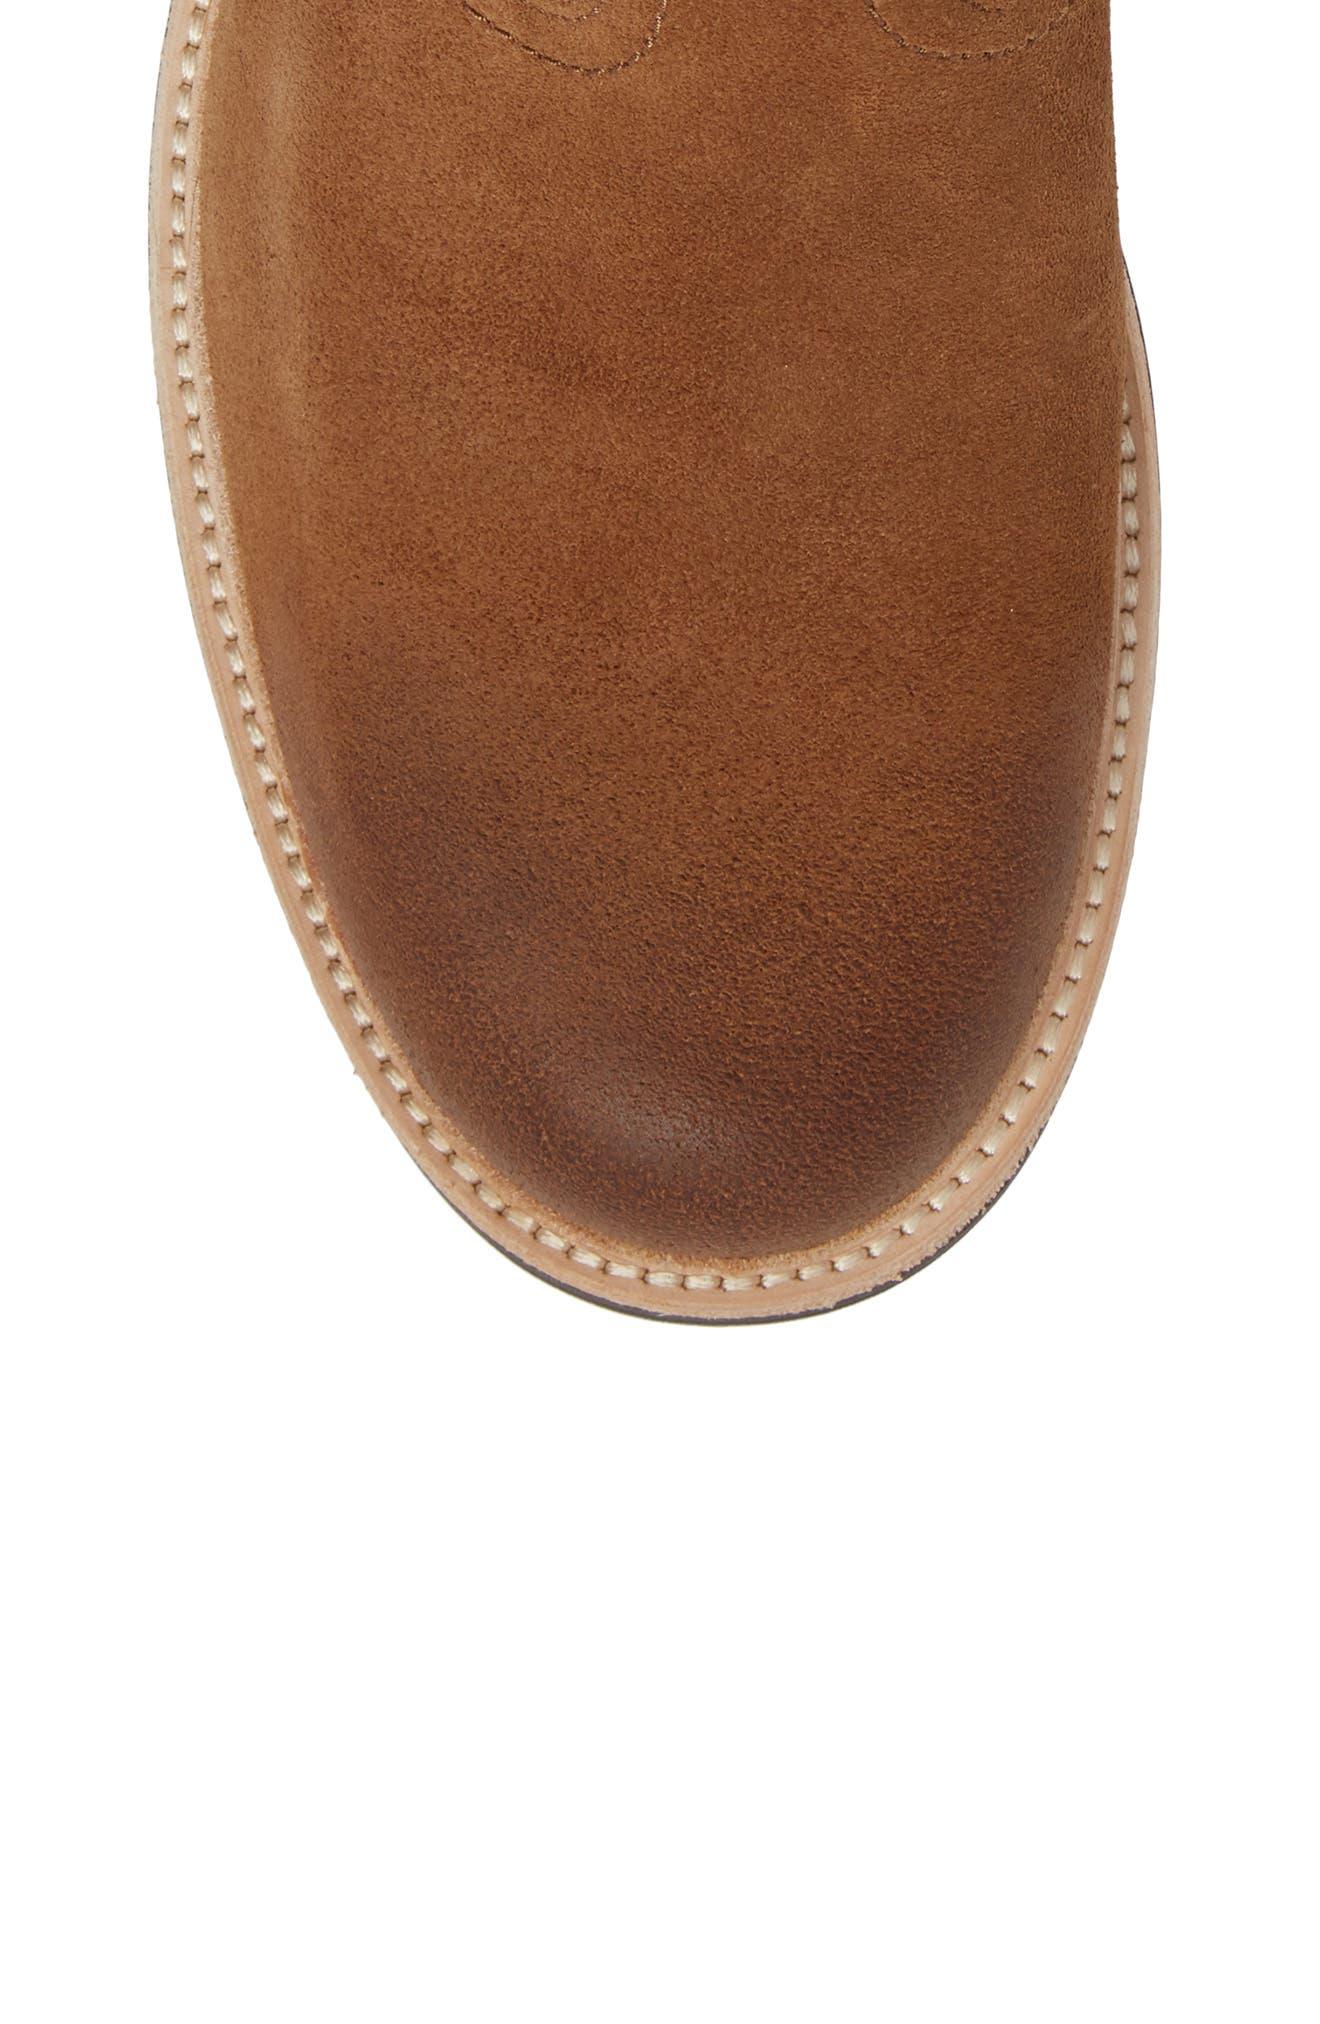 Jaren Zip Boot with Genuine Shearling,                             Alternate thumbnail 10, color,